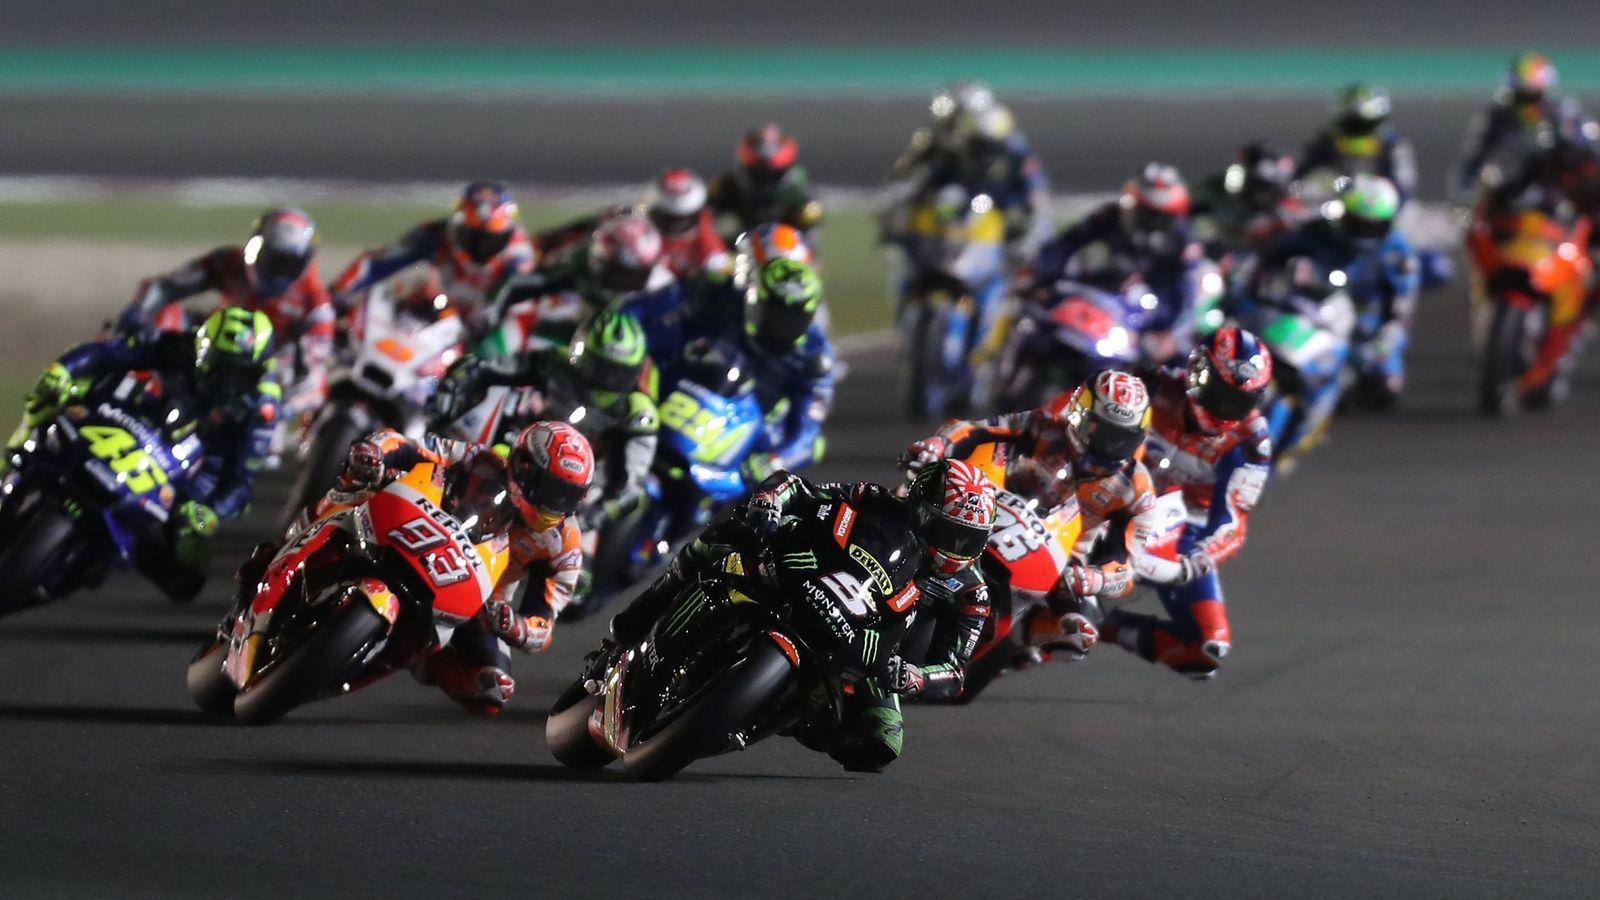 Dovizioso s'apunta la primera batalla de la temporada de MotoGP